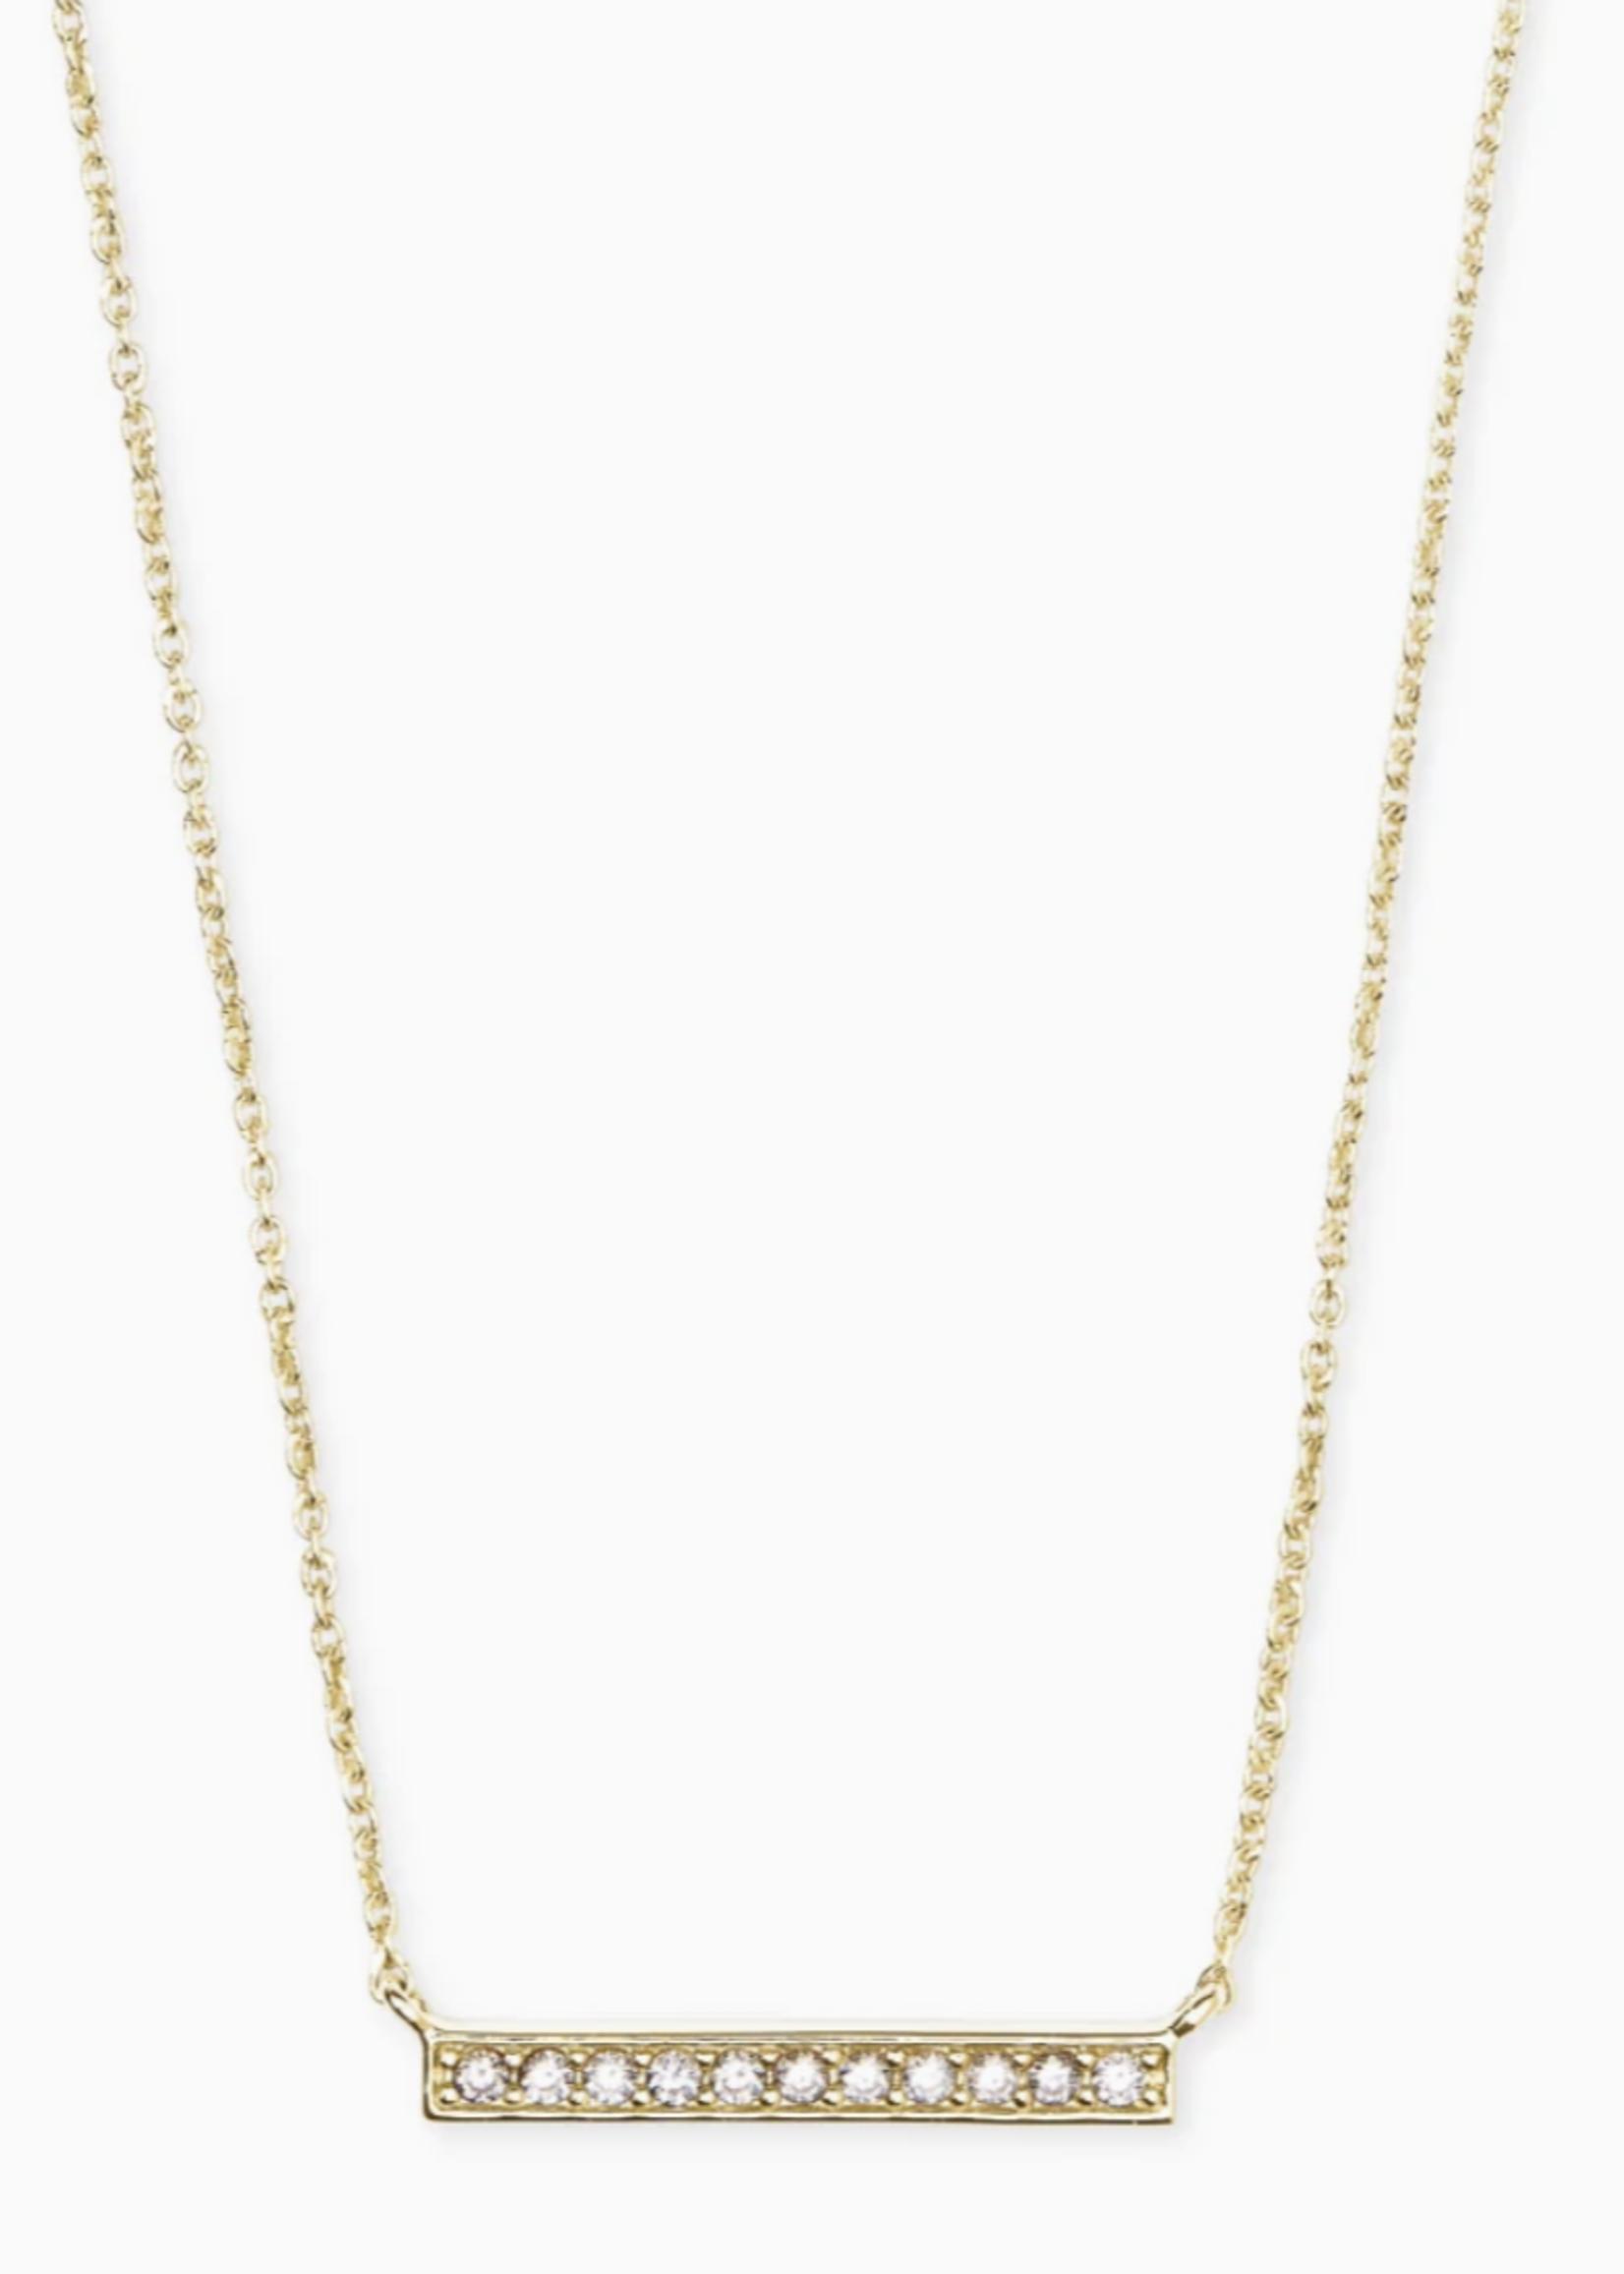 Kendra Scott Kendra Scott Addison Gold Bar Necklace